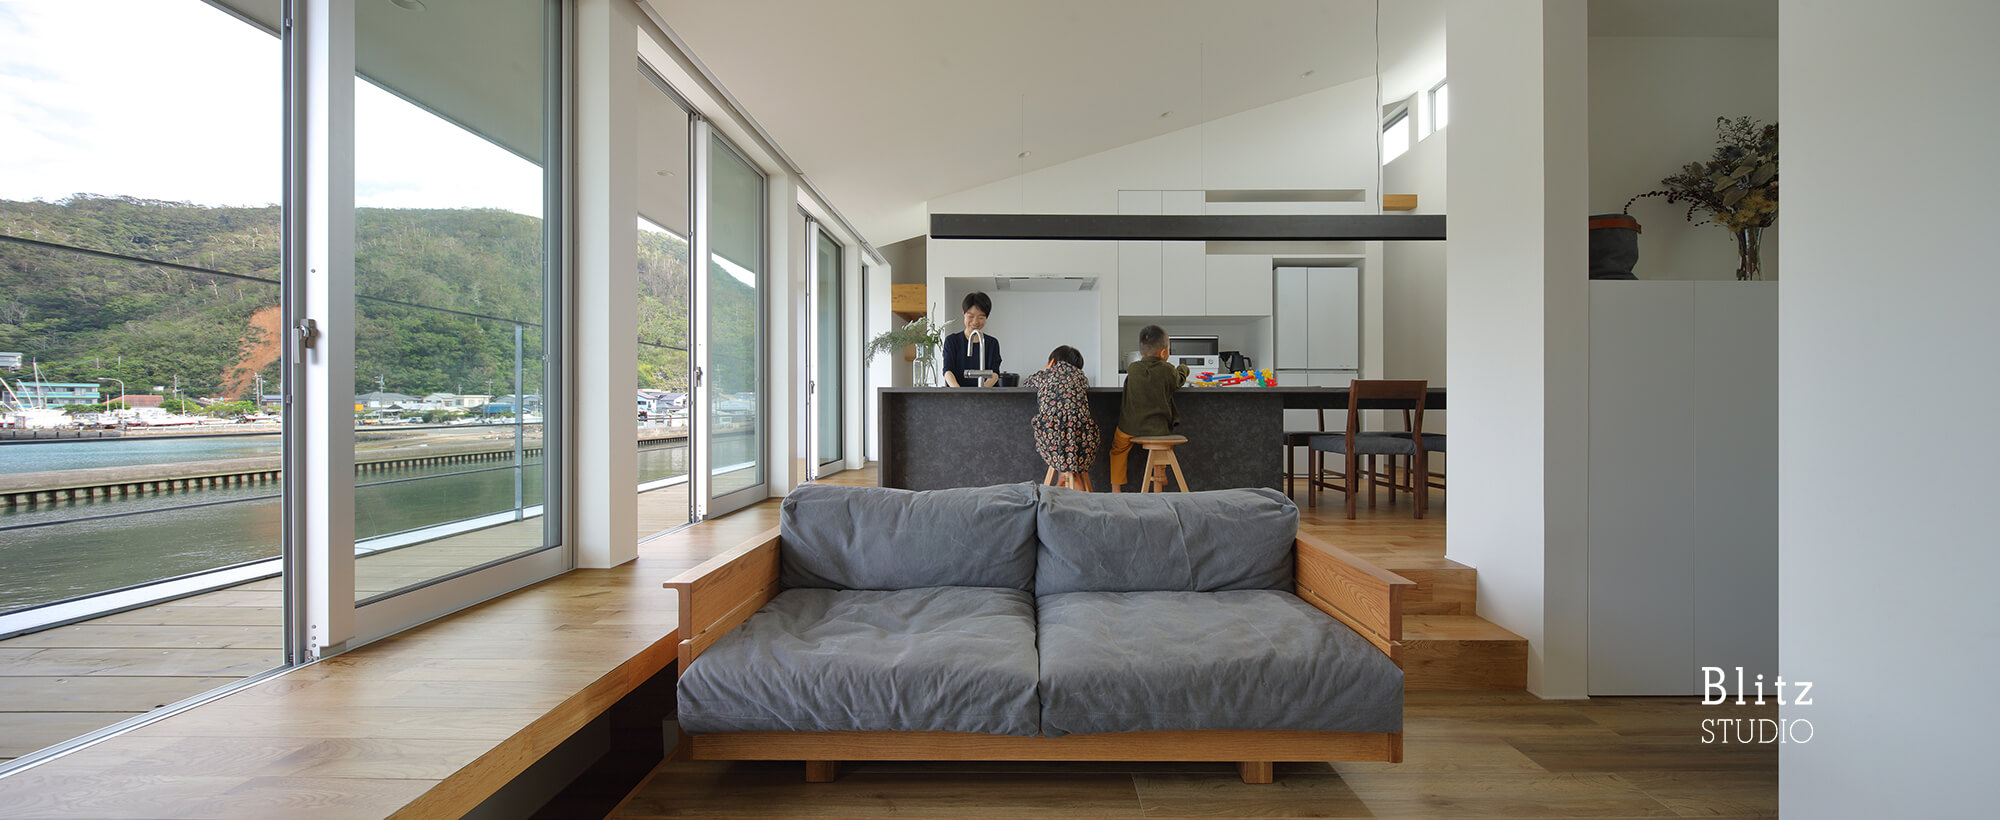 『名瀬鳩浜の家』-鹿児島県奄美大島-建築写真・竣工写真・インテリア写真5